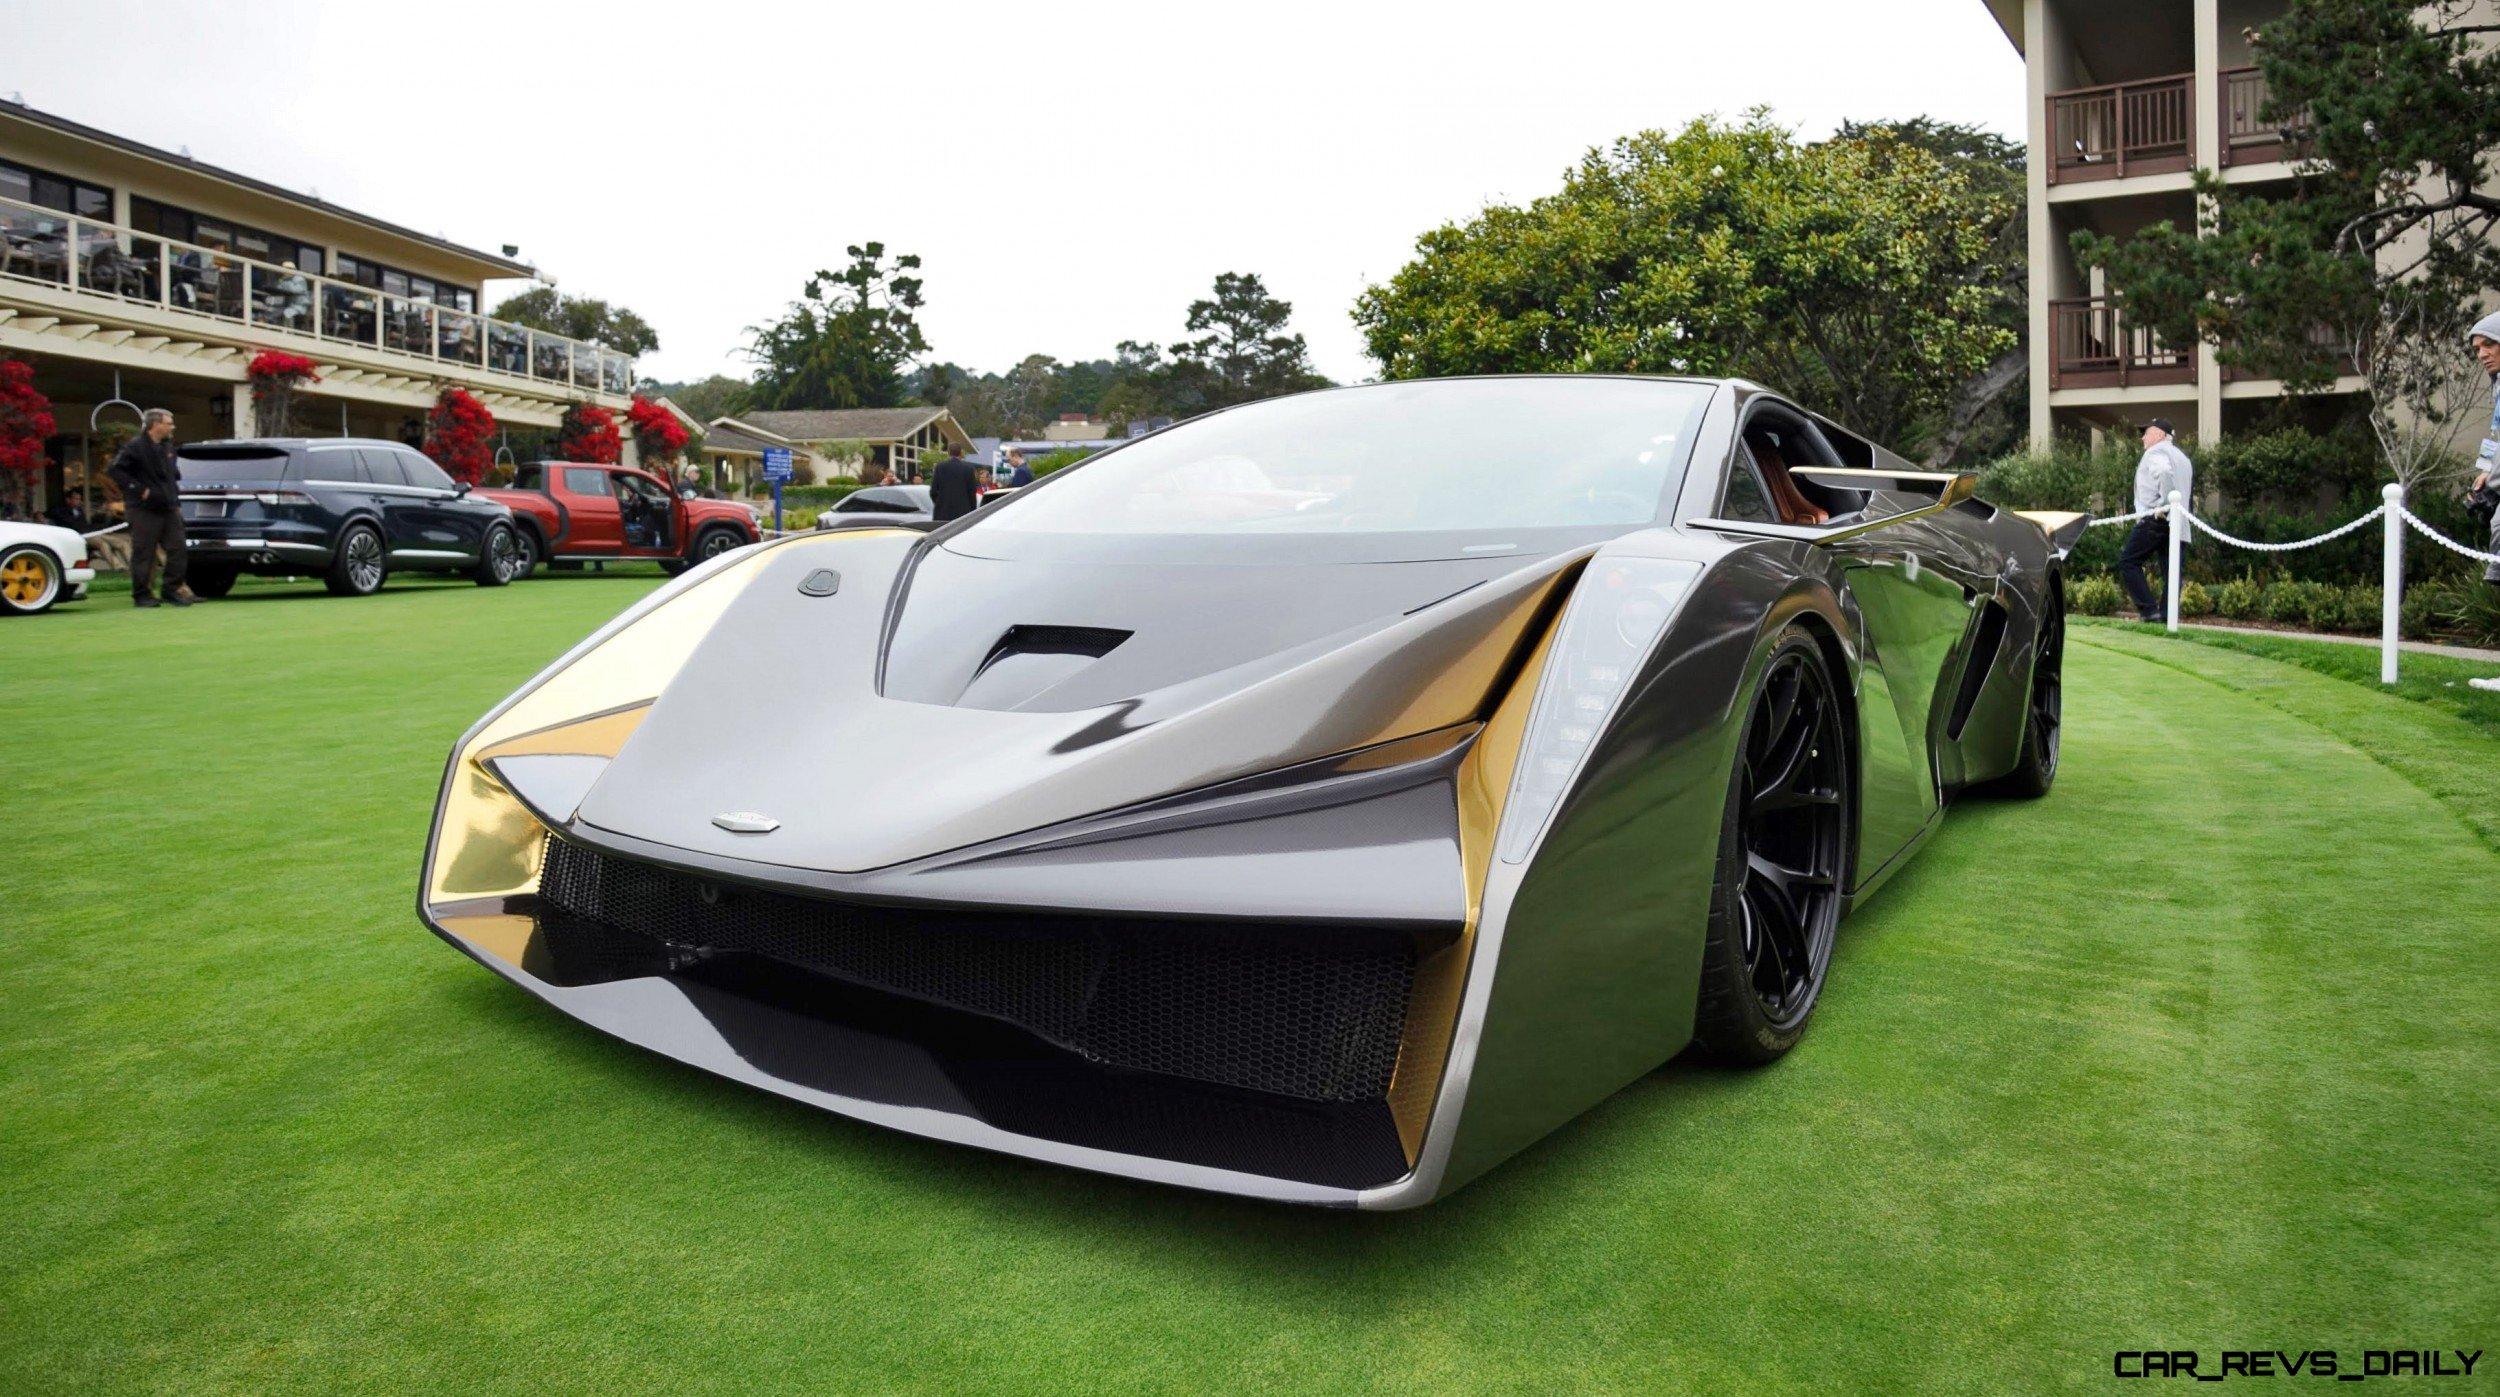 2018 SALAFF C2 Supercar Concept 12